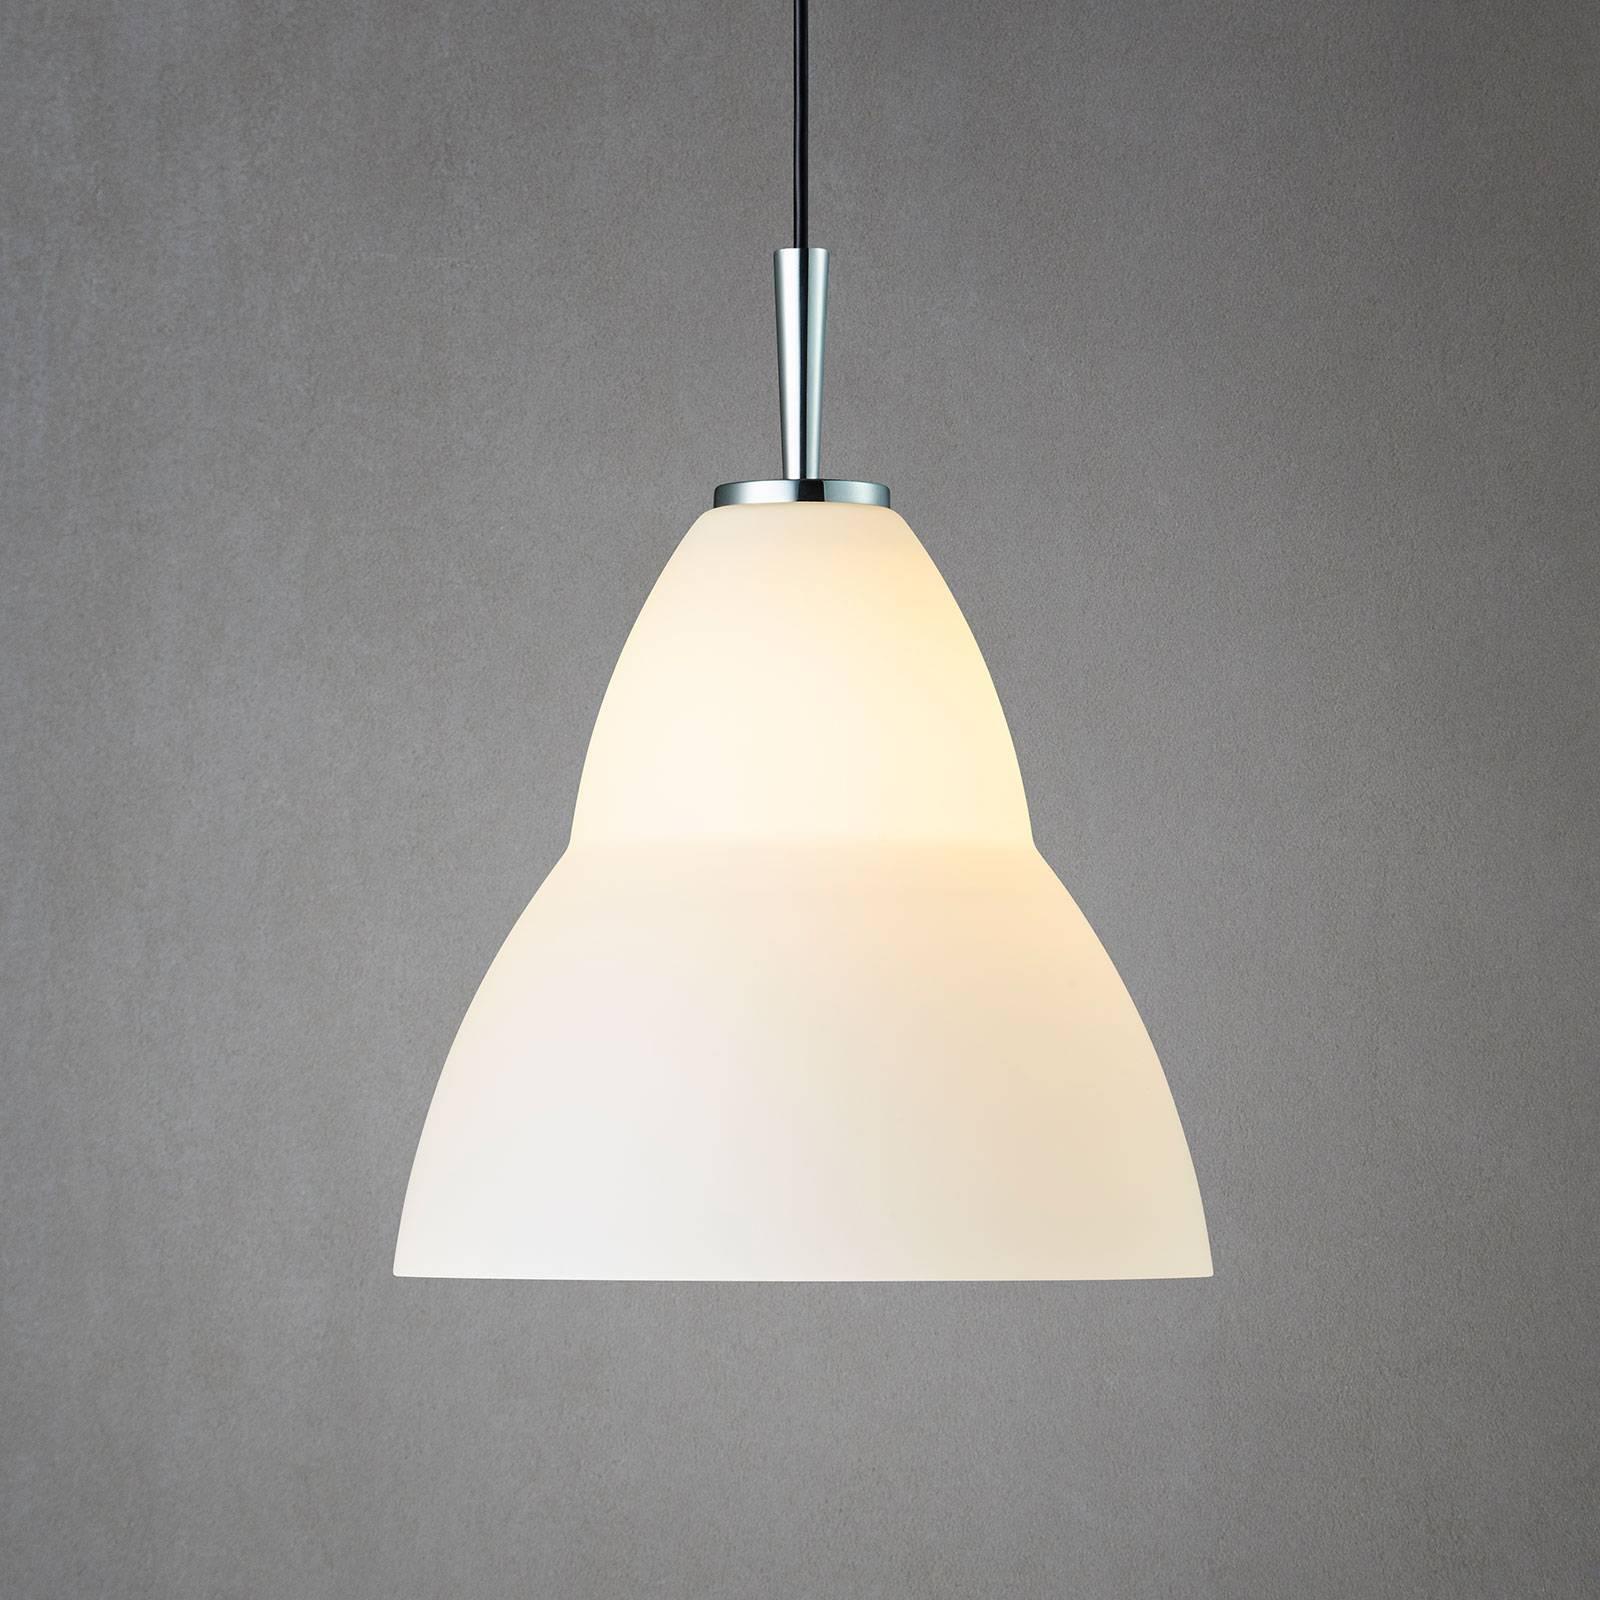 Glas-hanglamp Fico M, Ø 27 cm